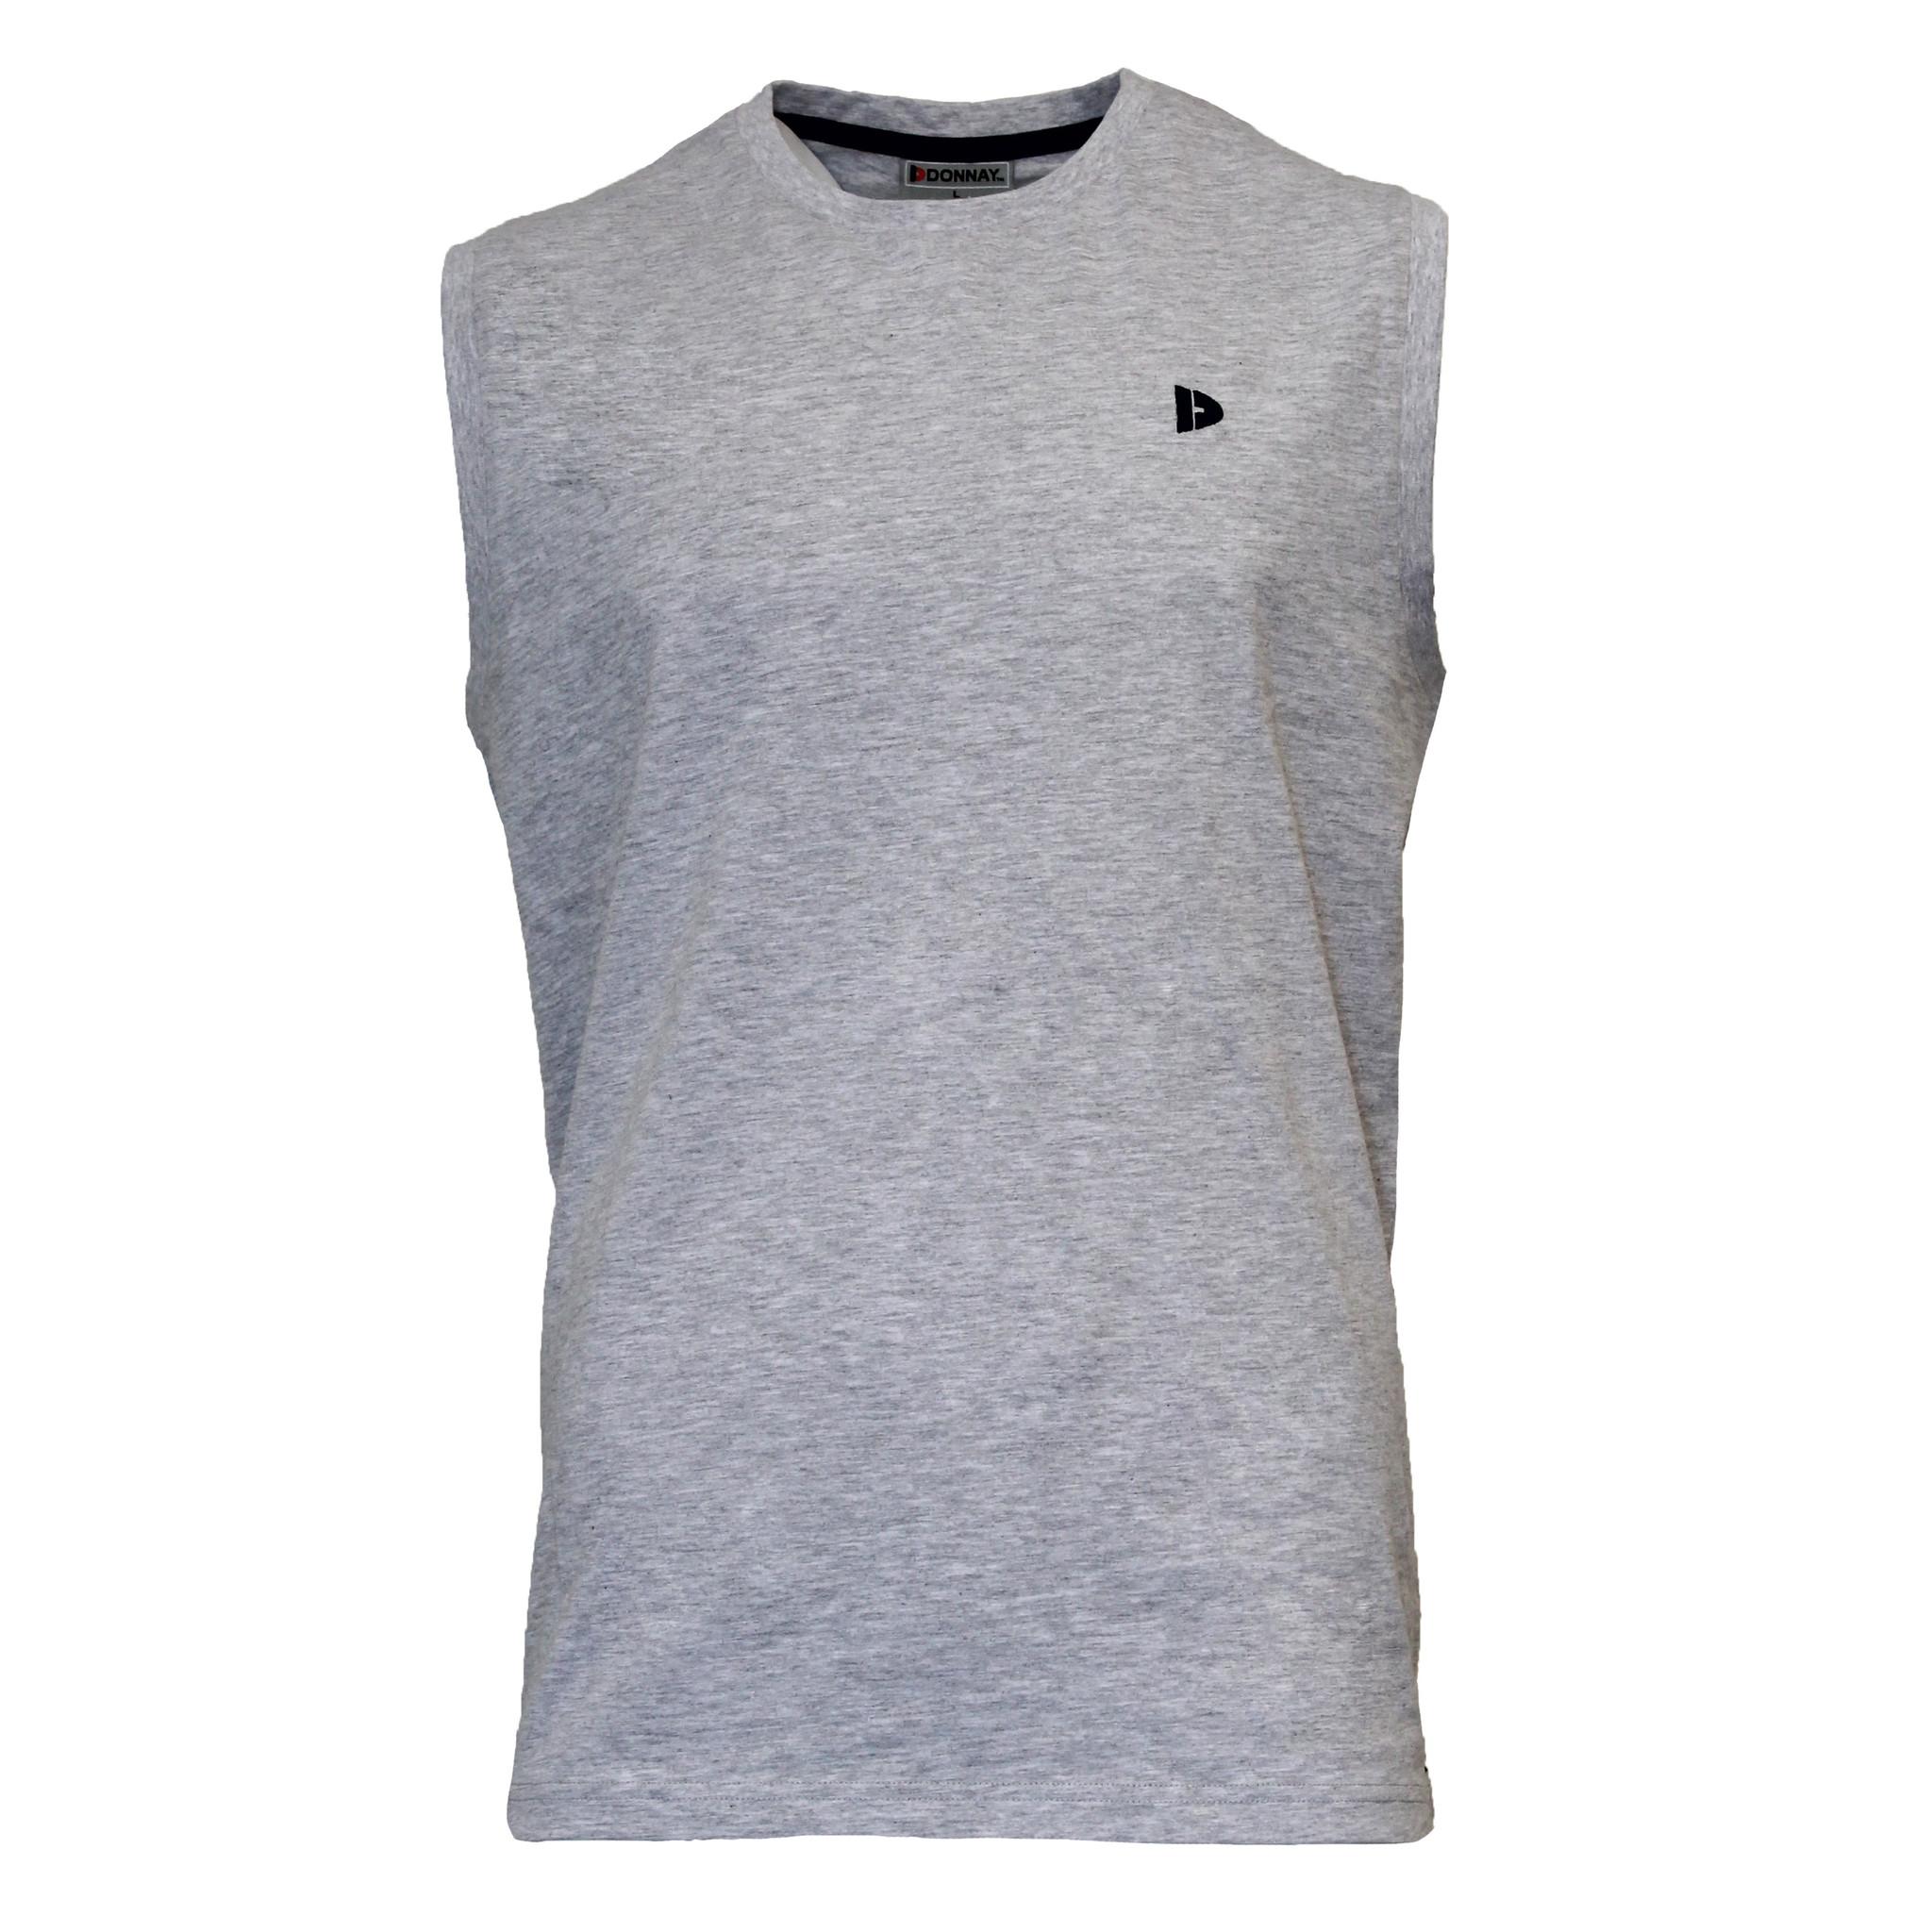 Donnay Donnay Heren - Mouwloos T-shirt Stan - Lichtgrijs gemêleerd